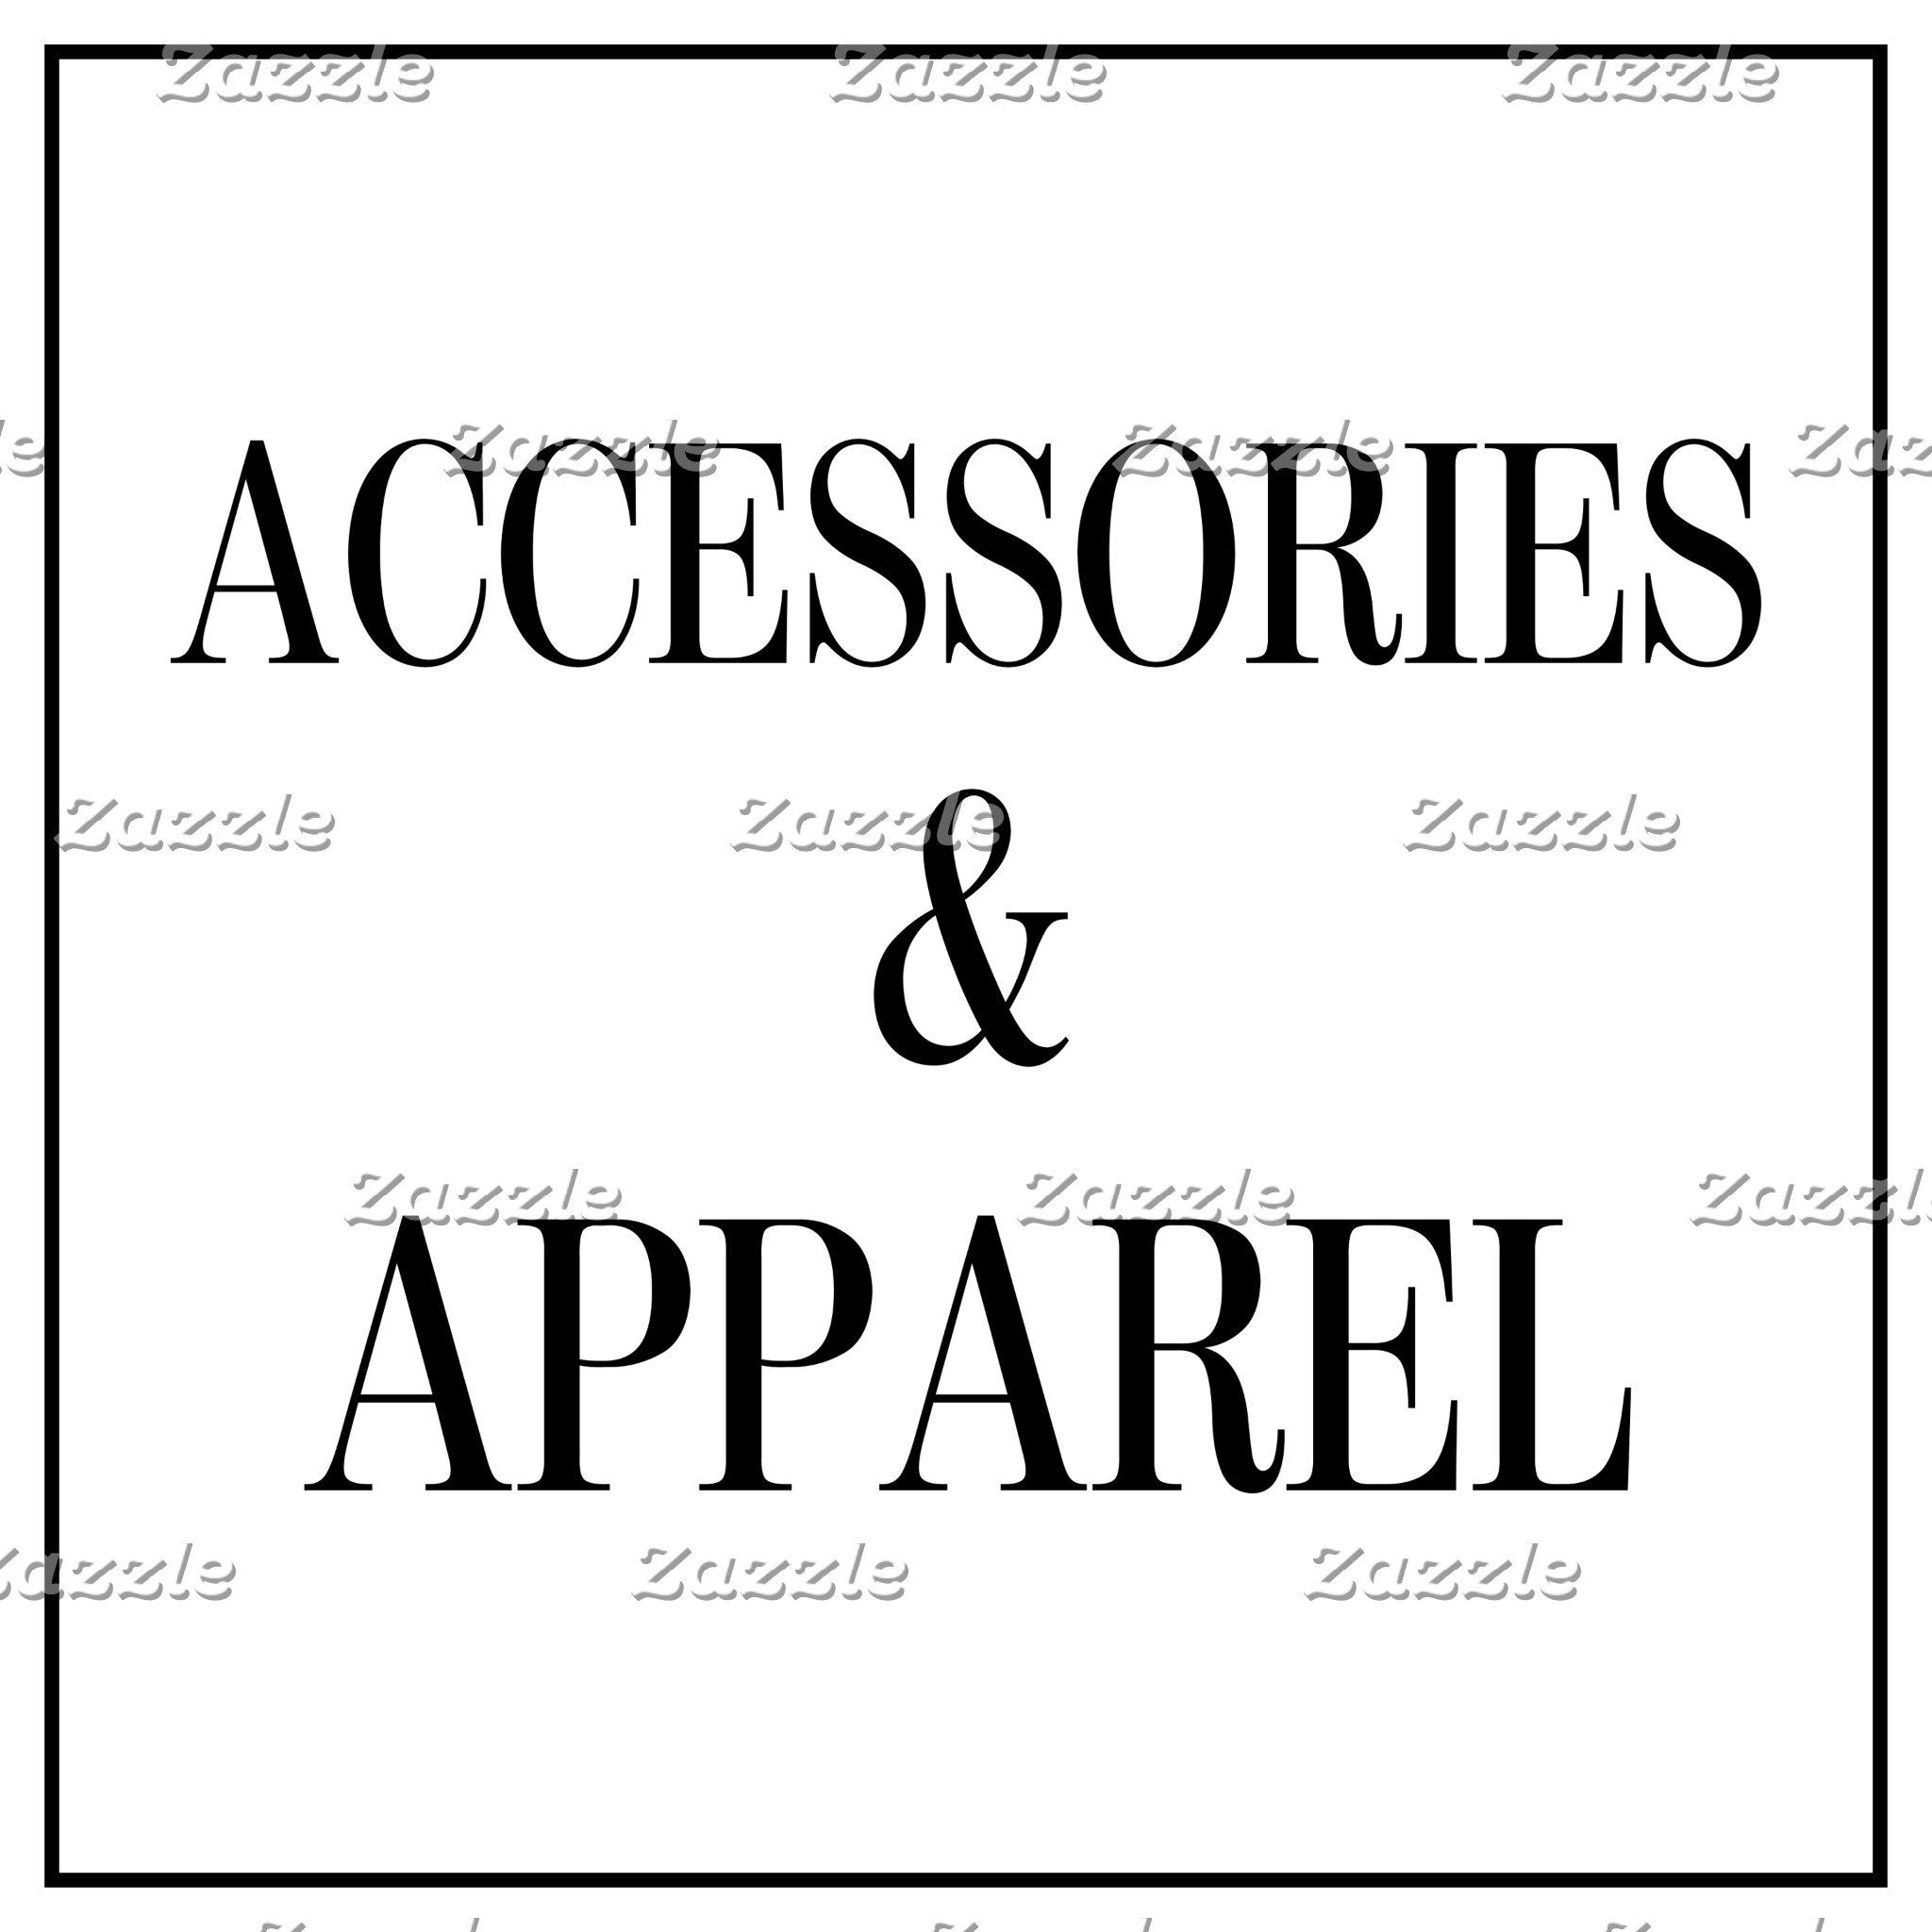 Accessories & Apparel